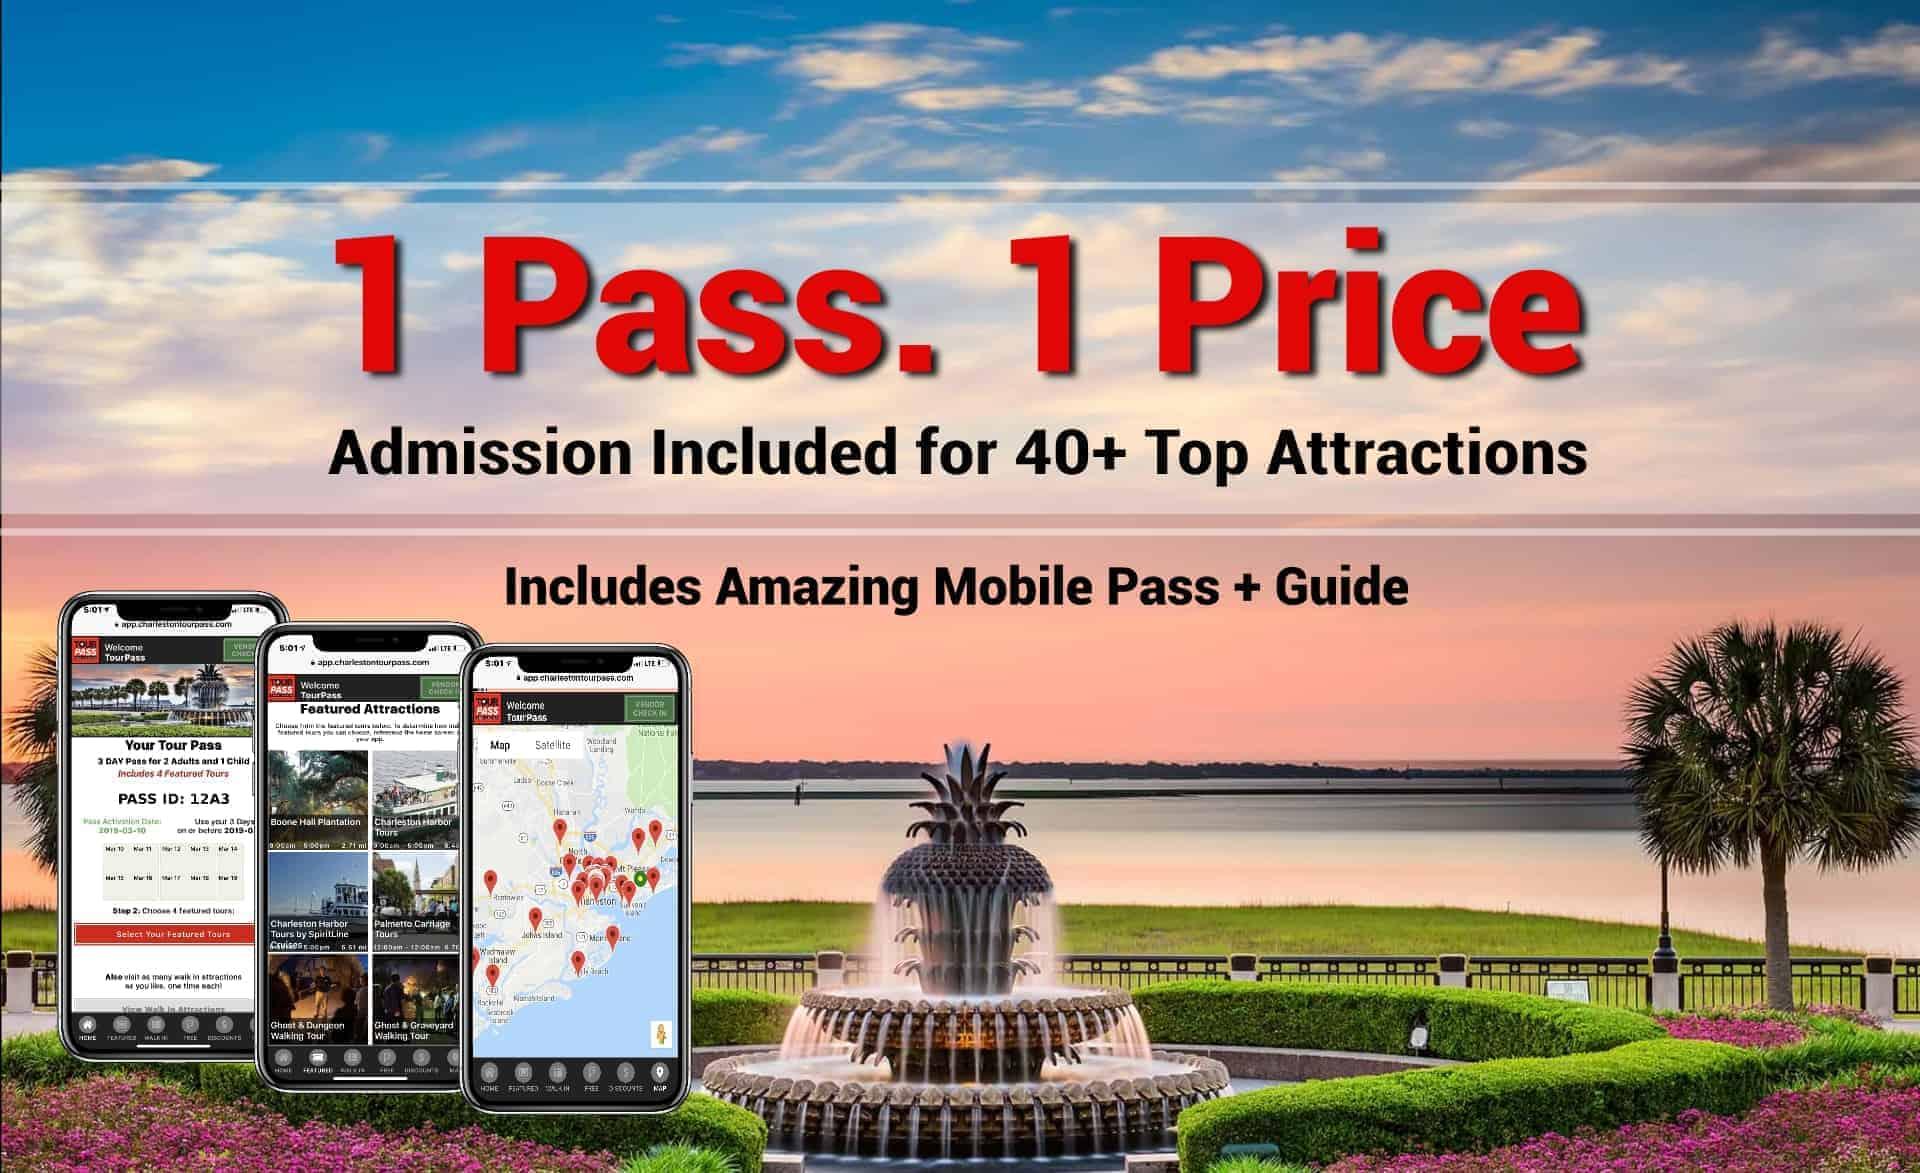 tour pass charleston . 1 pass. 1 price